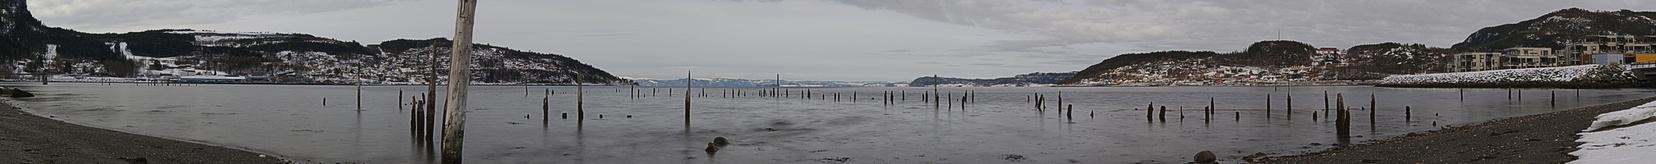 Panoramafotografie vom Trondheimfjord